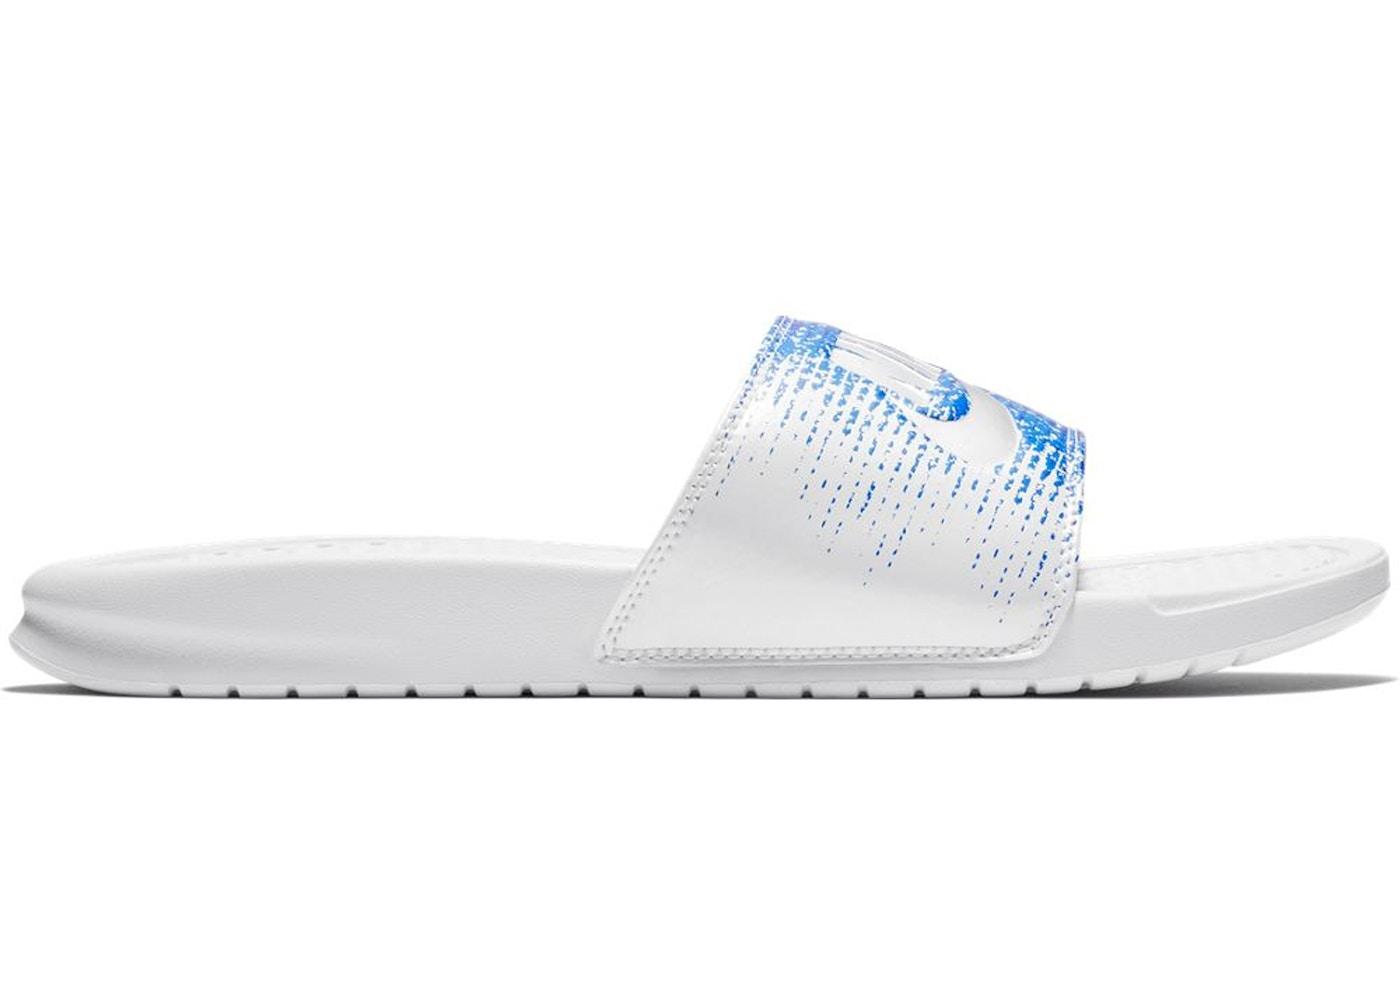 0798bd2635a9 Nike Benassi USA - AQ7983-100